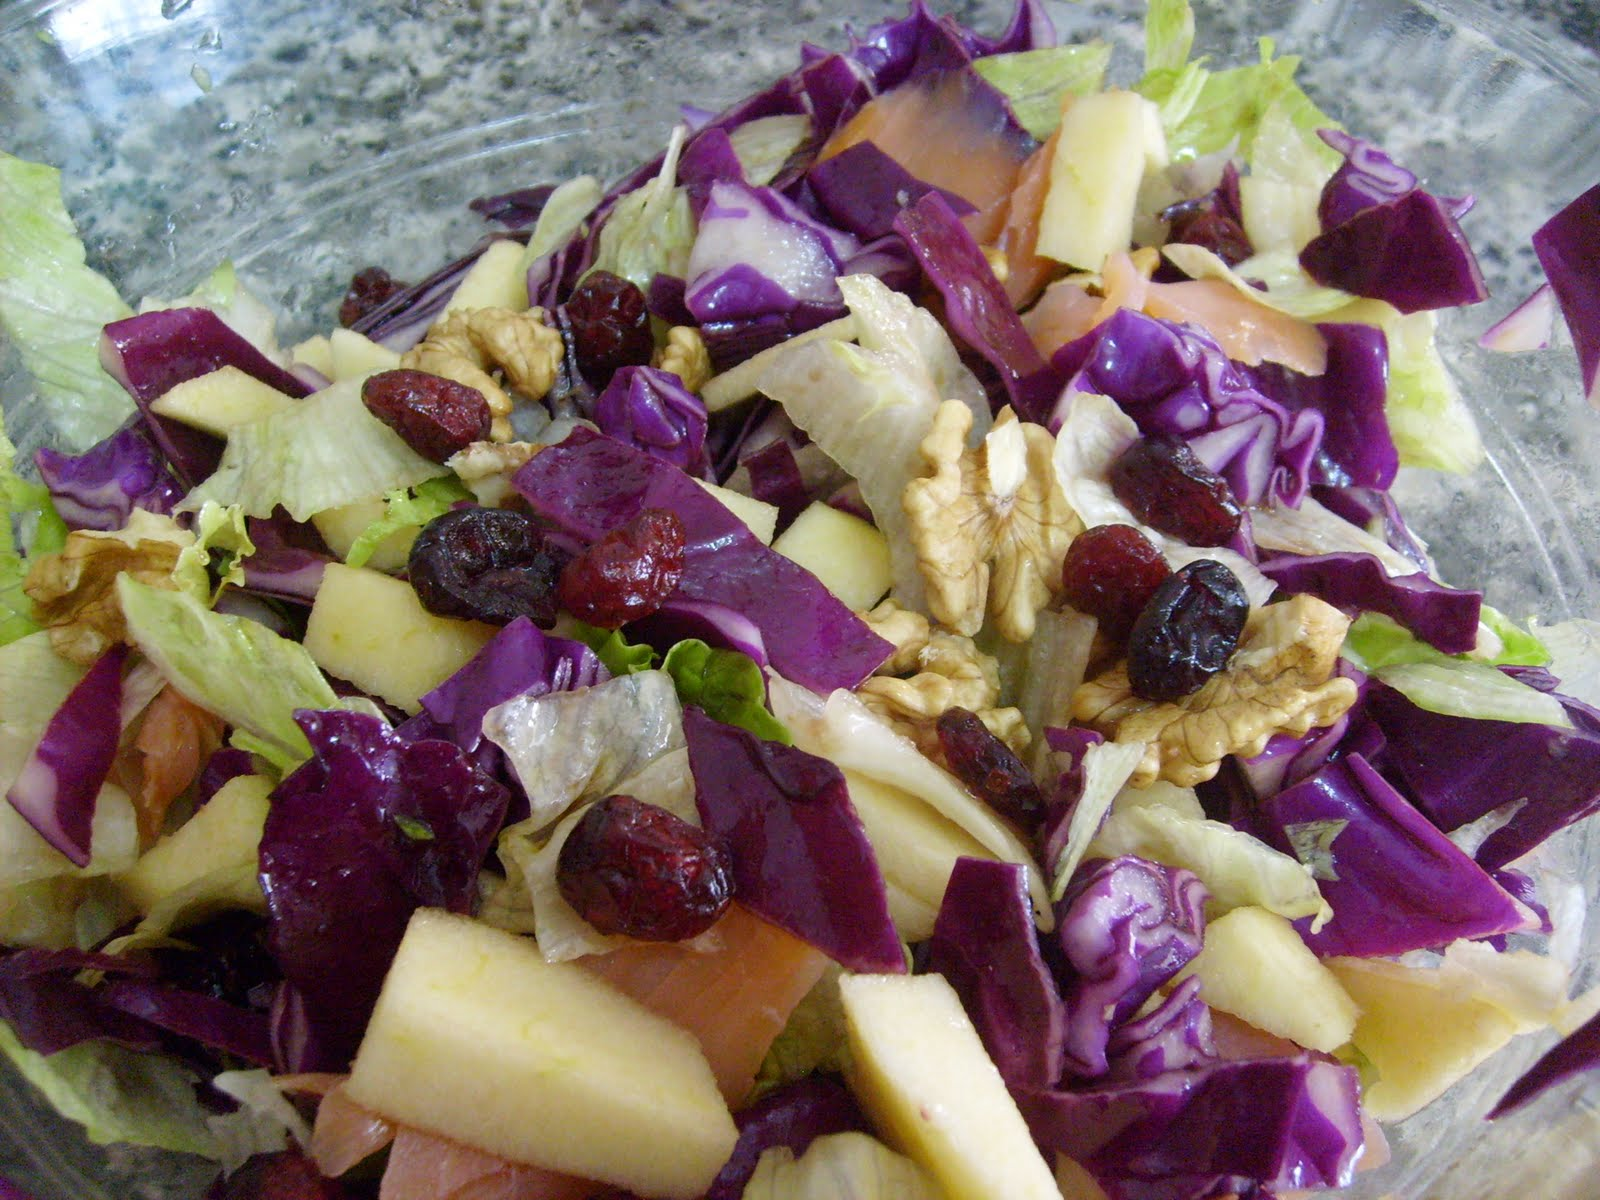 Cocinar Lombarda Con Manzana | Recetas Para Adelgazar Ensalada De Lombarda Con Salsa De Yogur